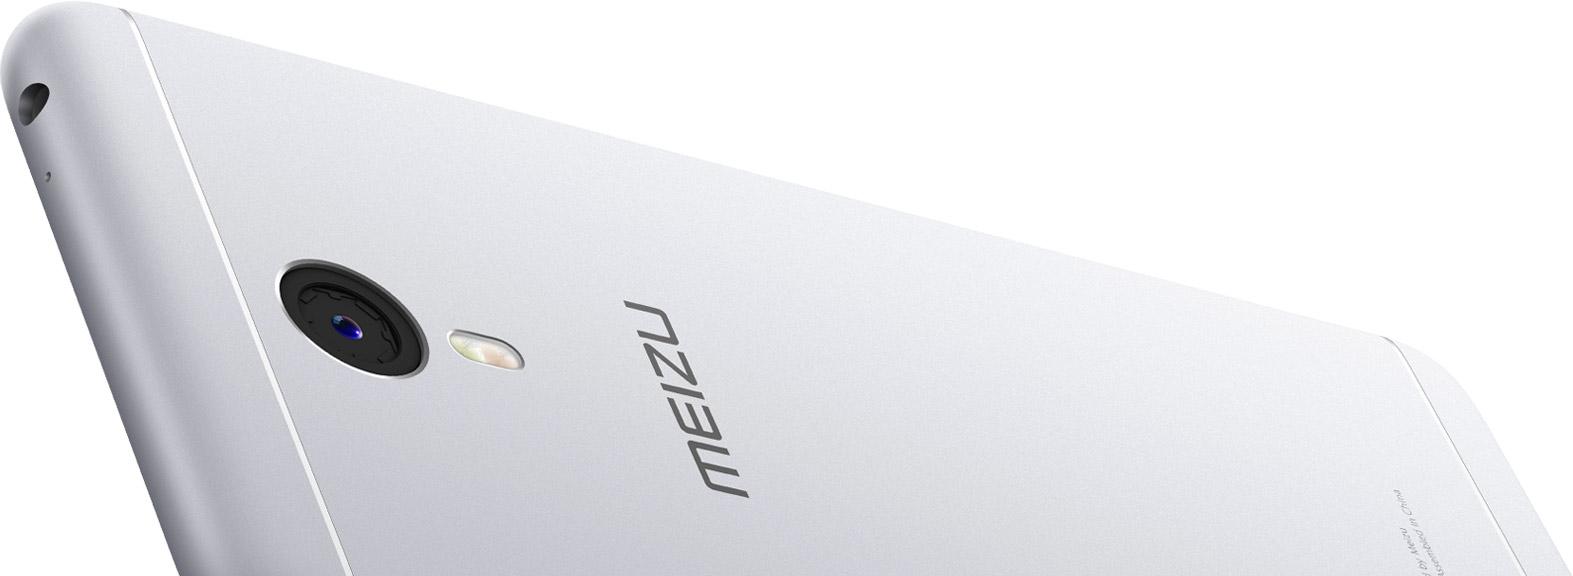 تعرف علي مواصفات و مميزات الهاتف الرائع Meizu m3 Note